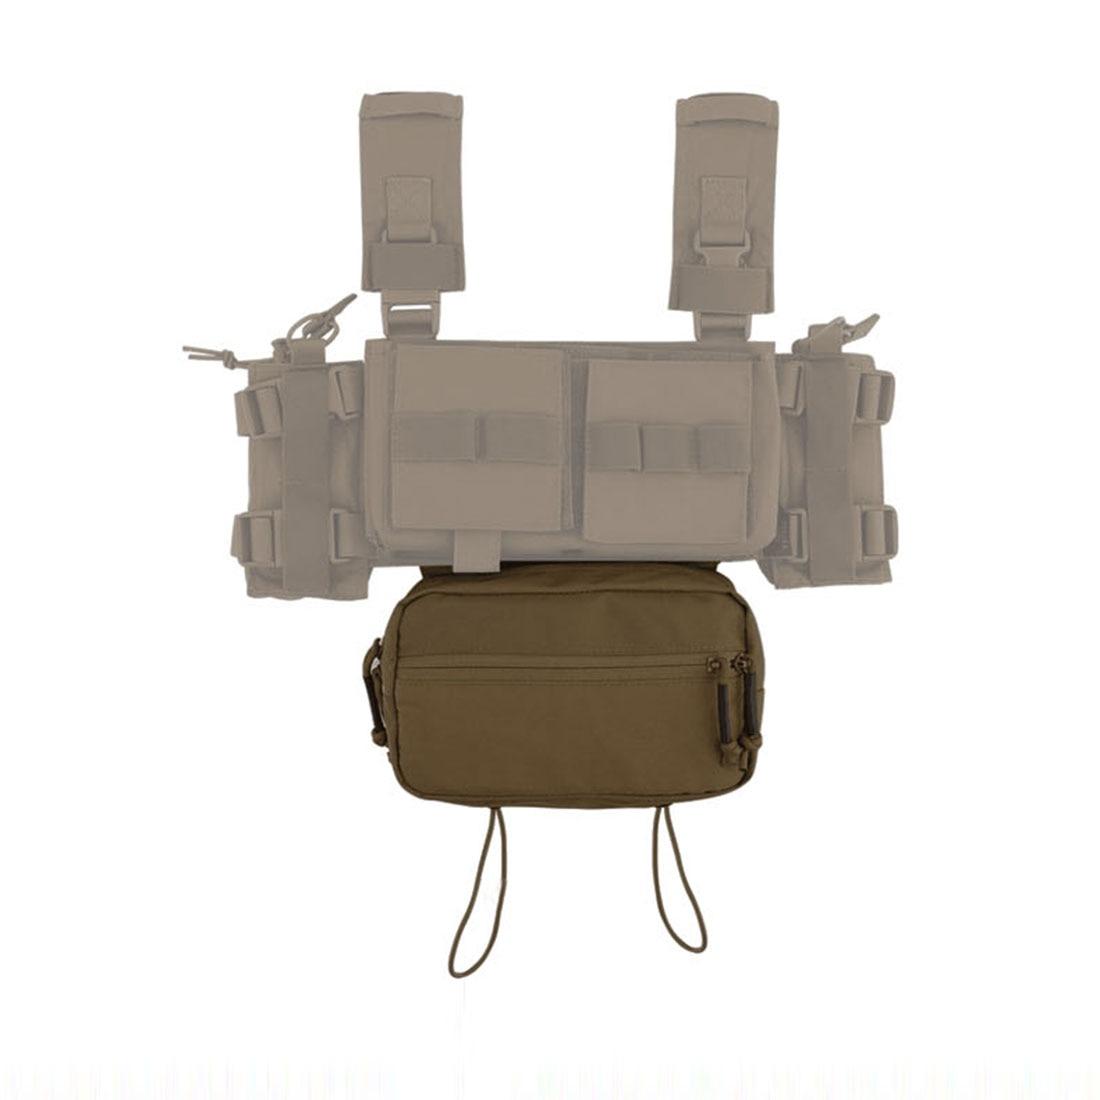 Krydex MK3 cintura bolsa JPC 6094 AVS CPC chaleco táctico militar al aire libre táctico accesorios Bolsa-camuflaje negro